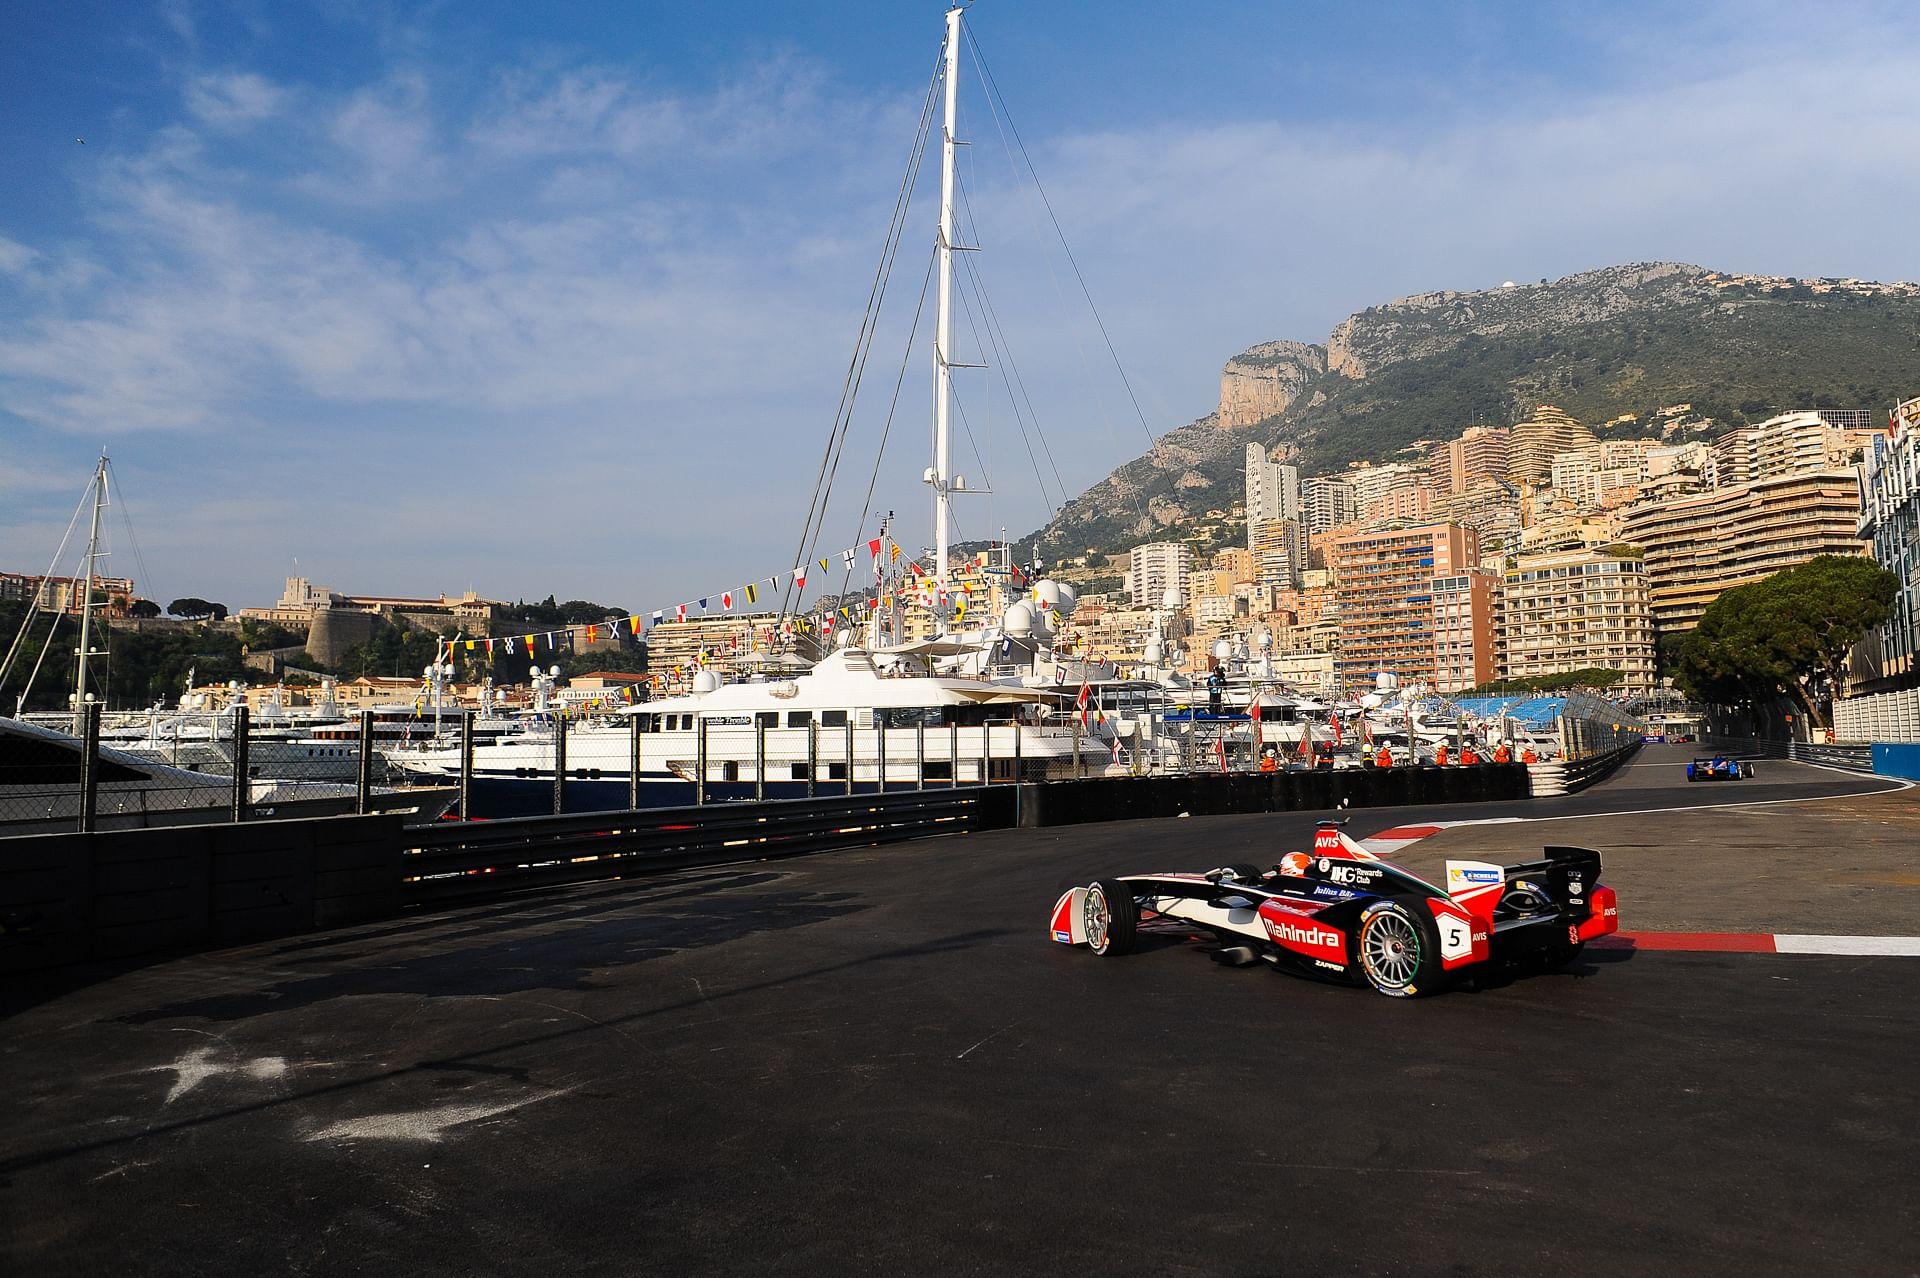 Monaco brings upset for Mahindra Racing in Formula E